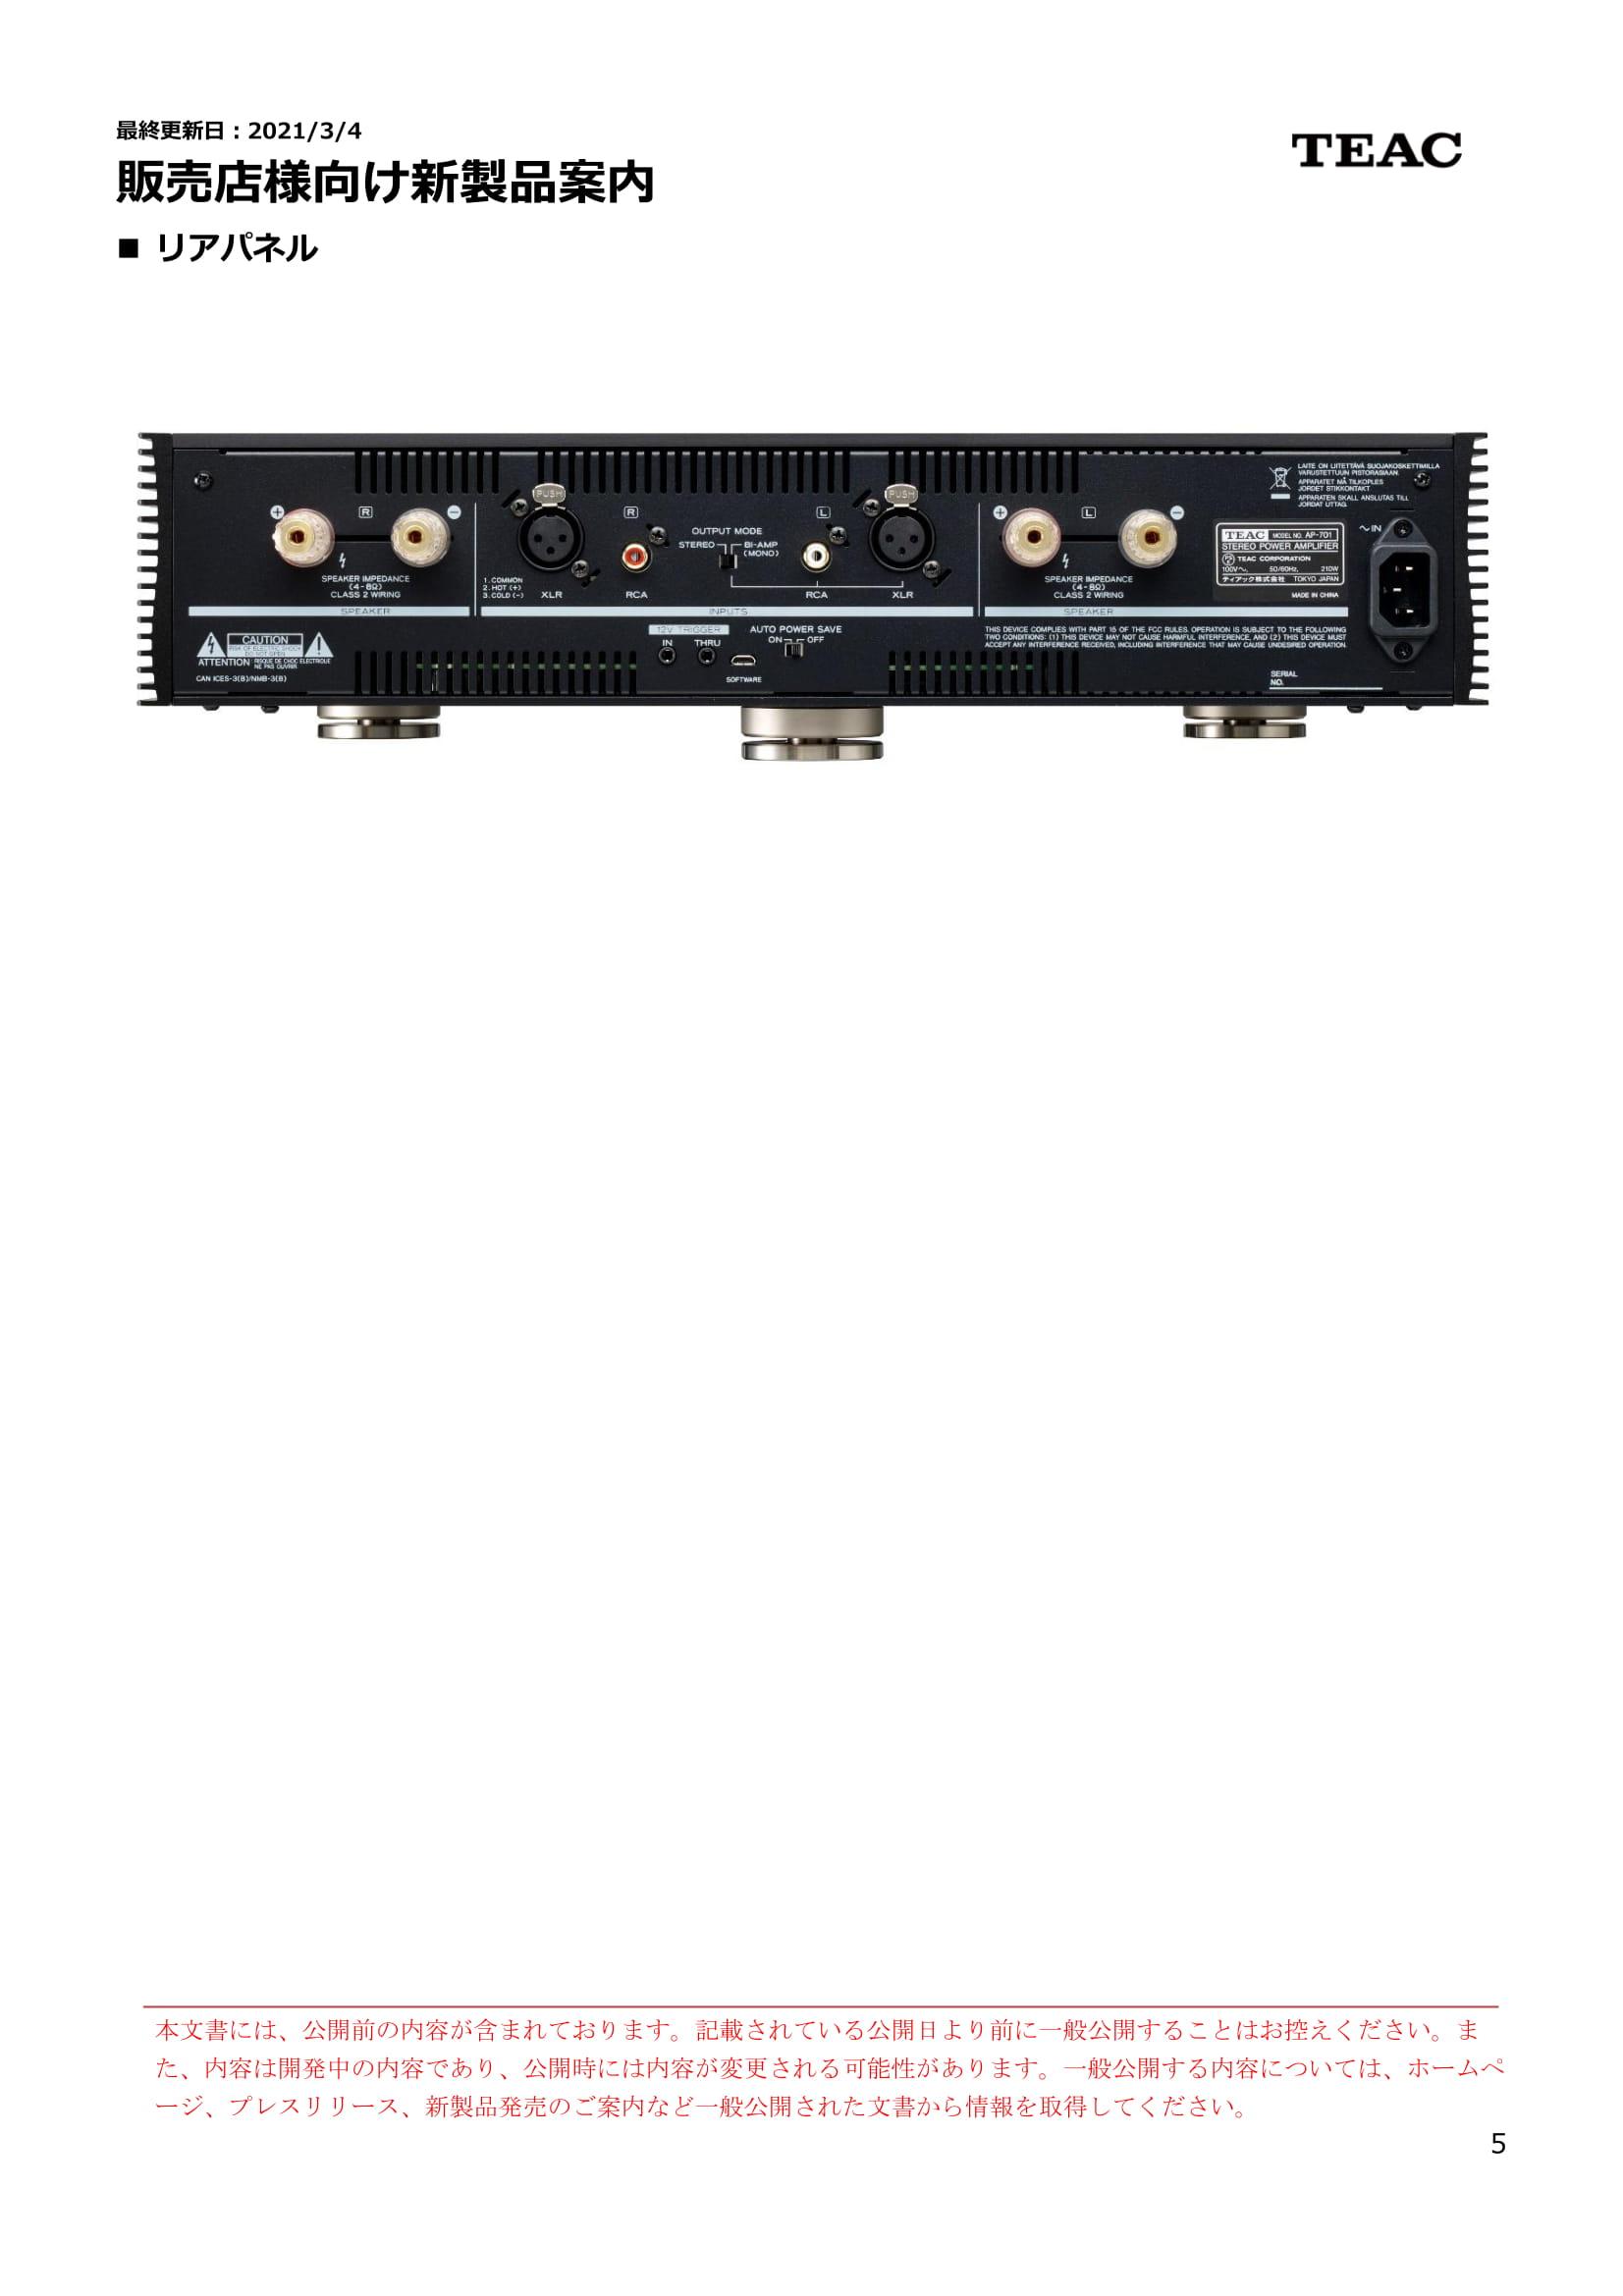 AP-701_SNPI_210304-5.jpg